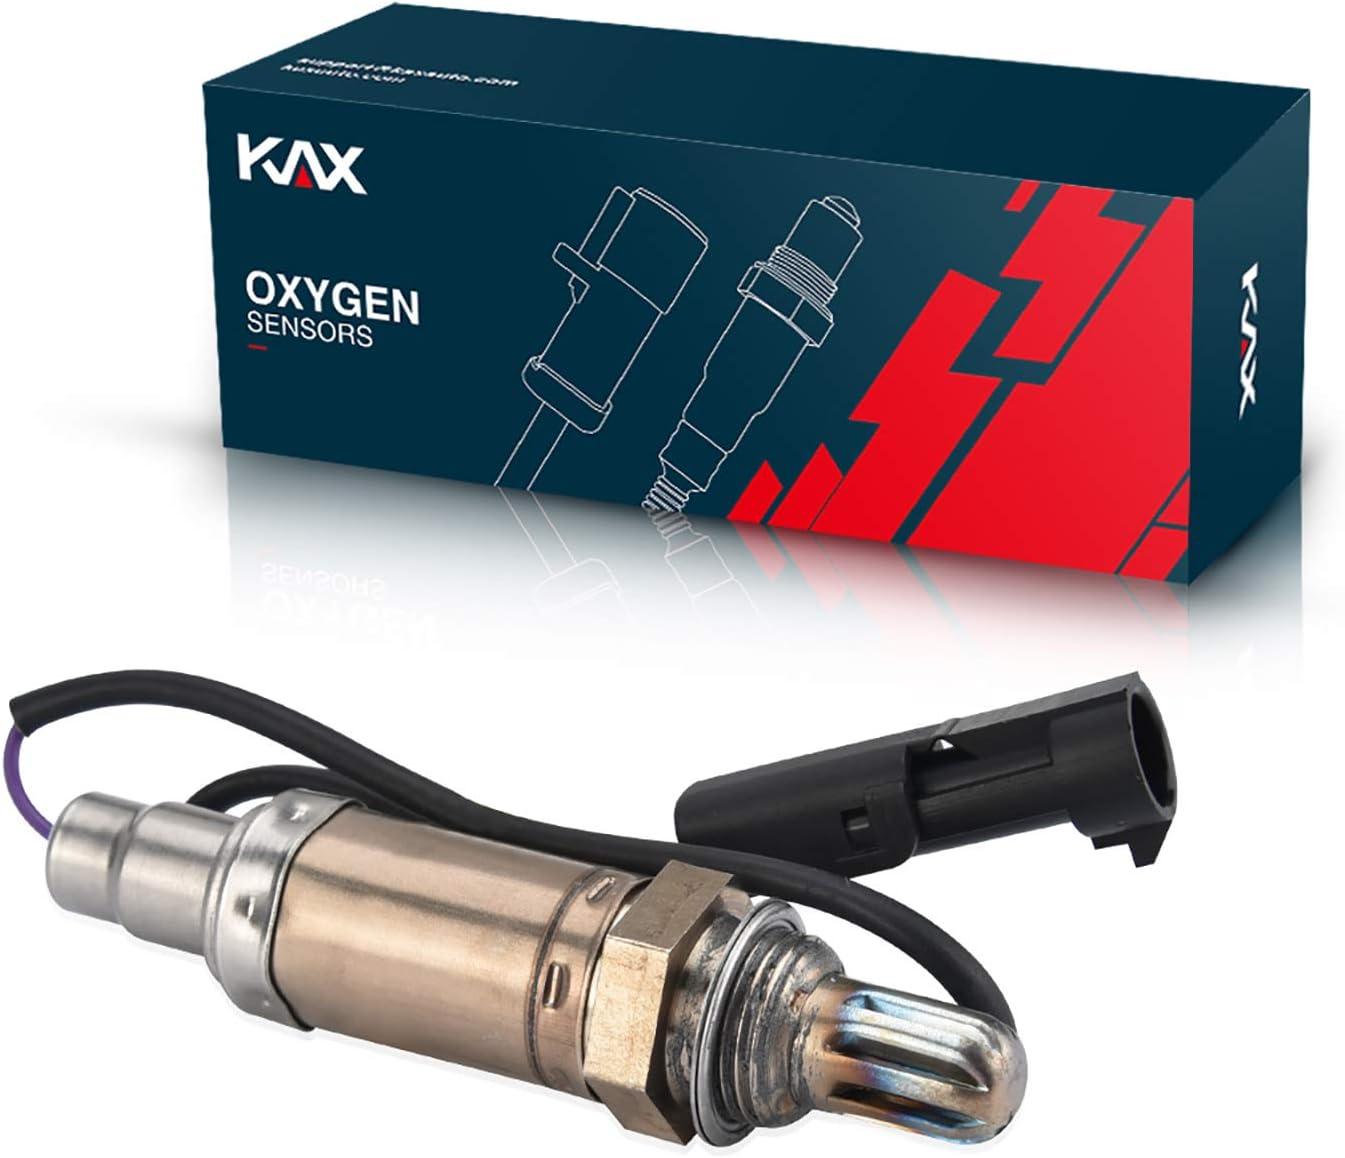 KAX Oxygen Sensor 250-21001 fit for C10 S10 K1500 Credence Cavalier C1500 Large special price !!